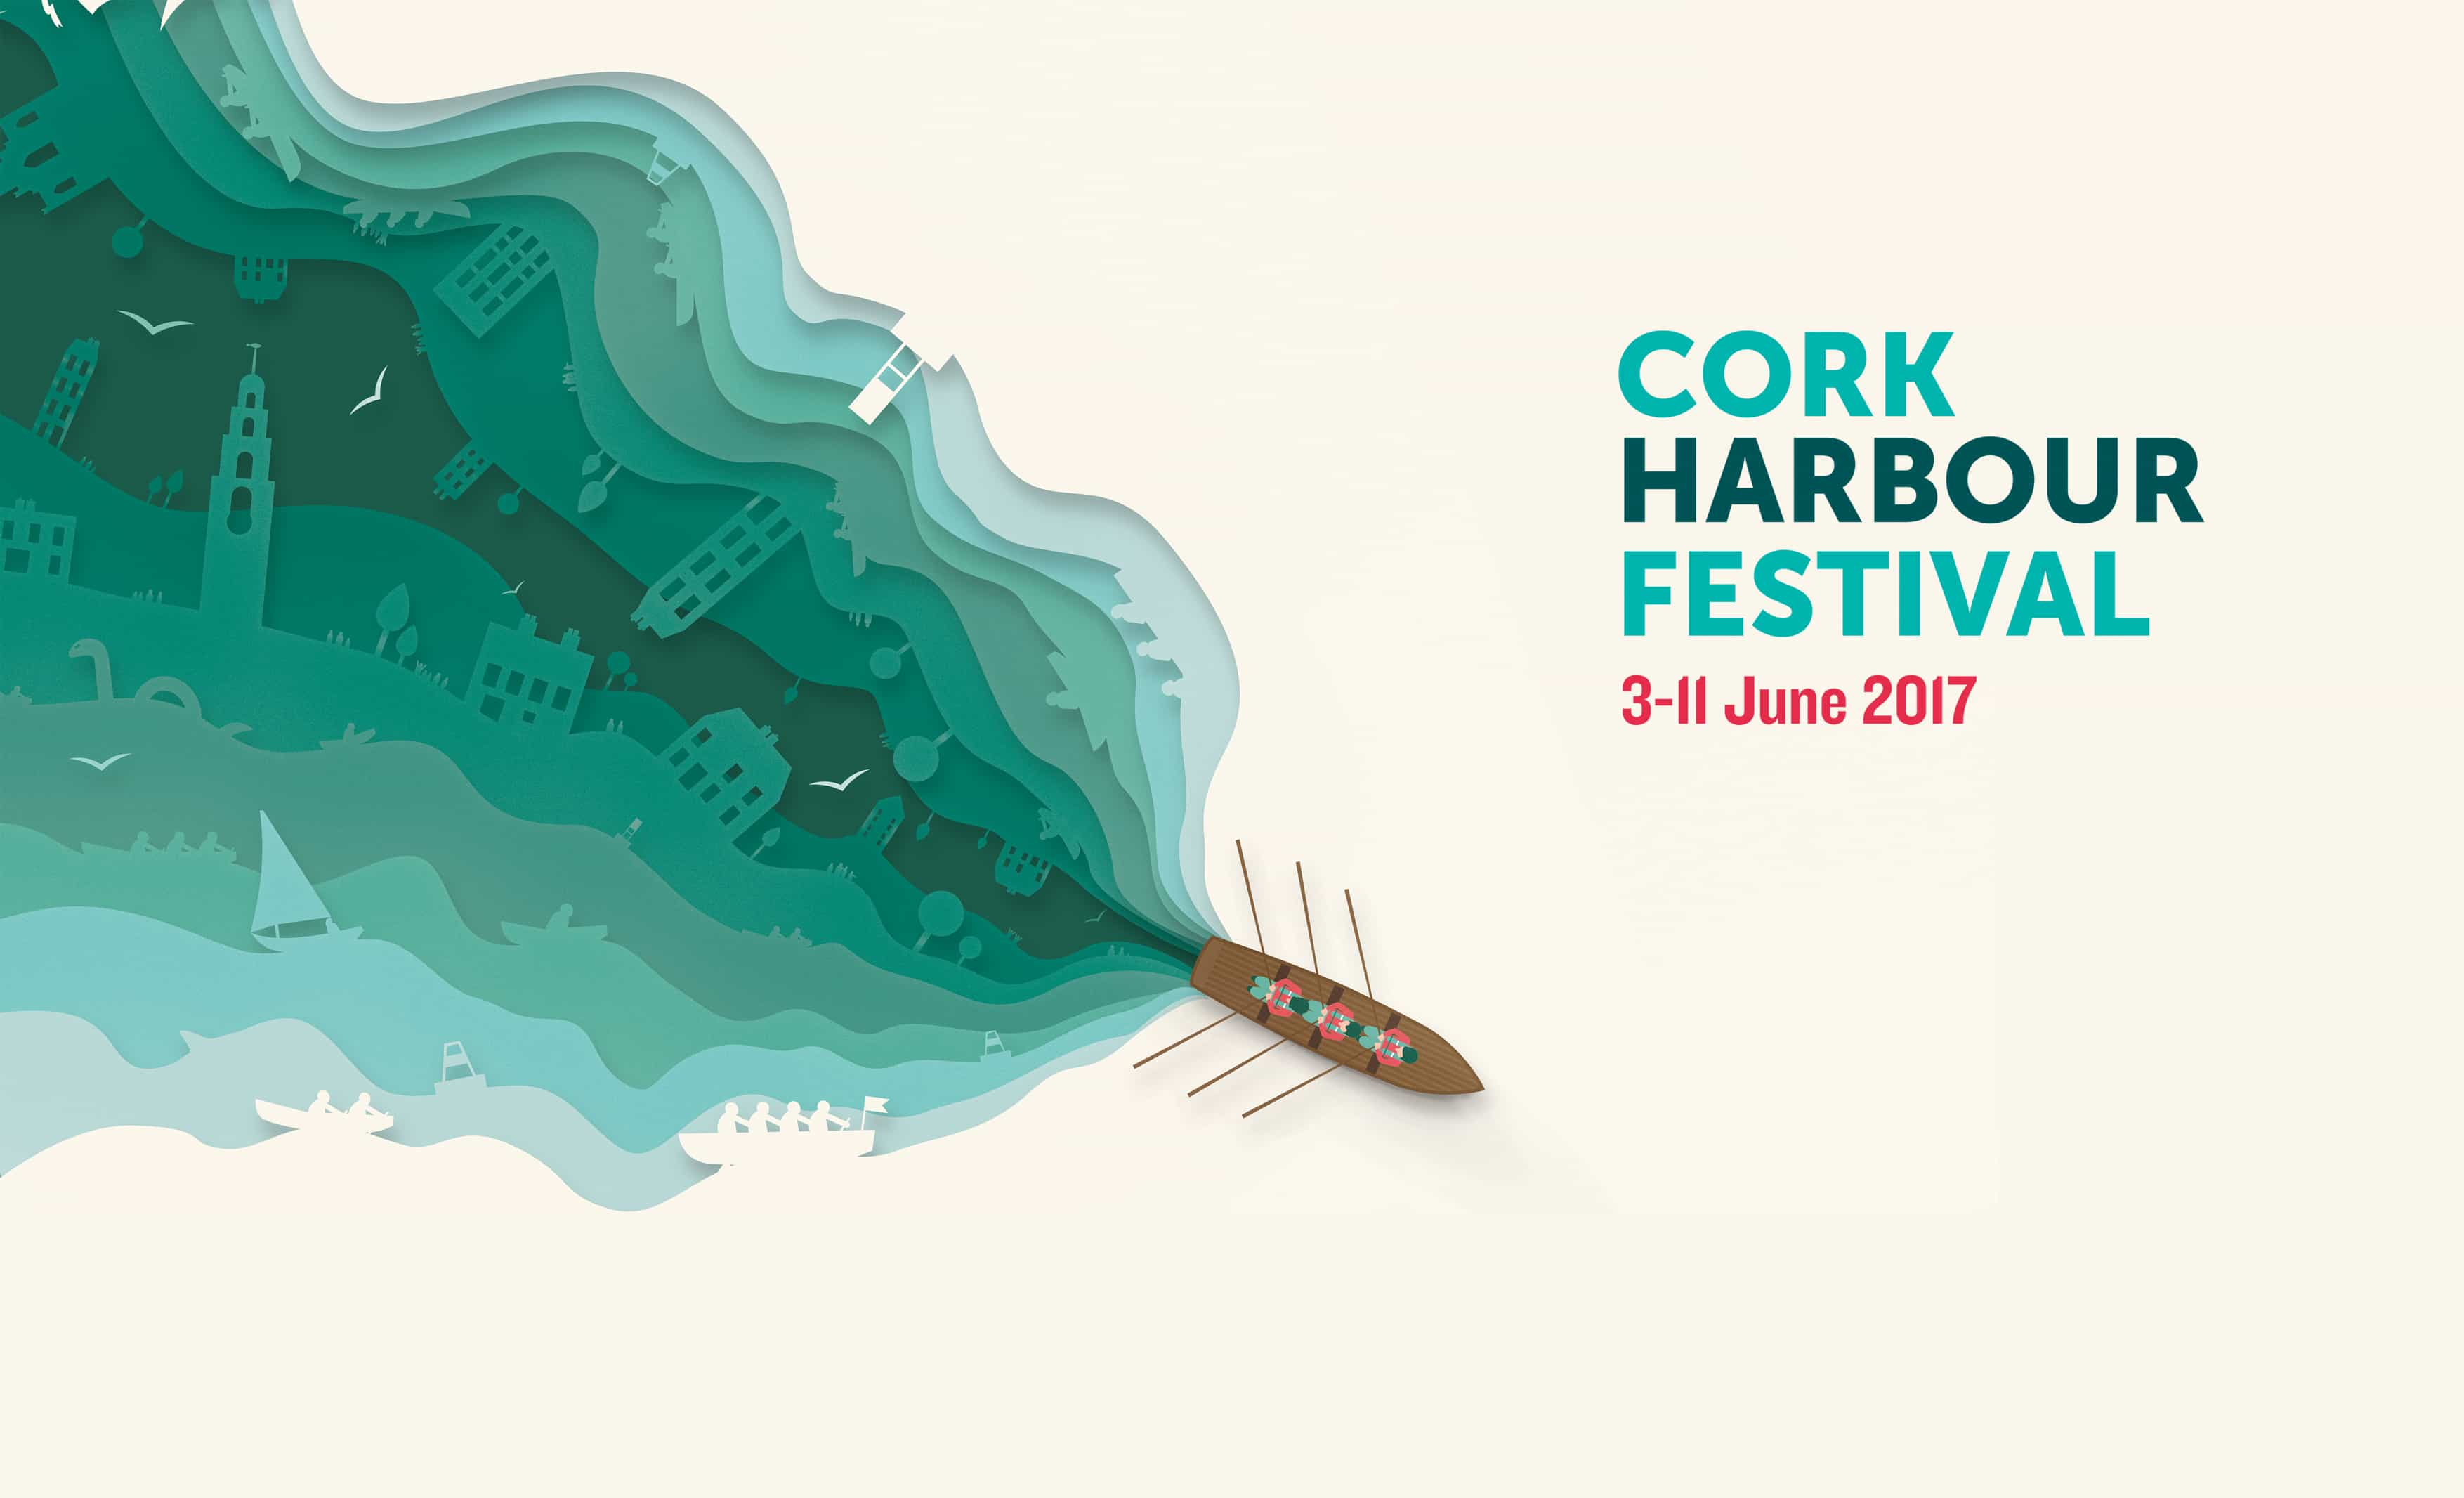 Cork Harbour Festival